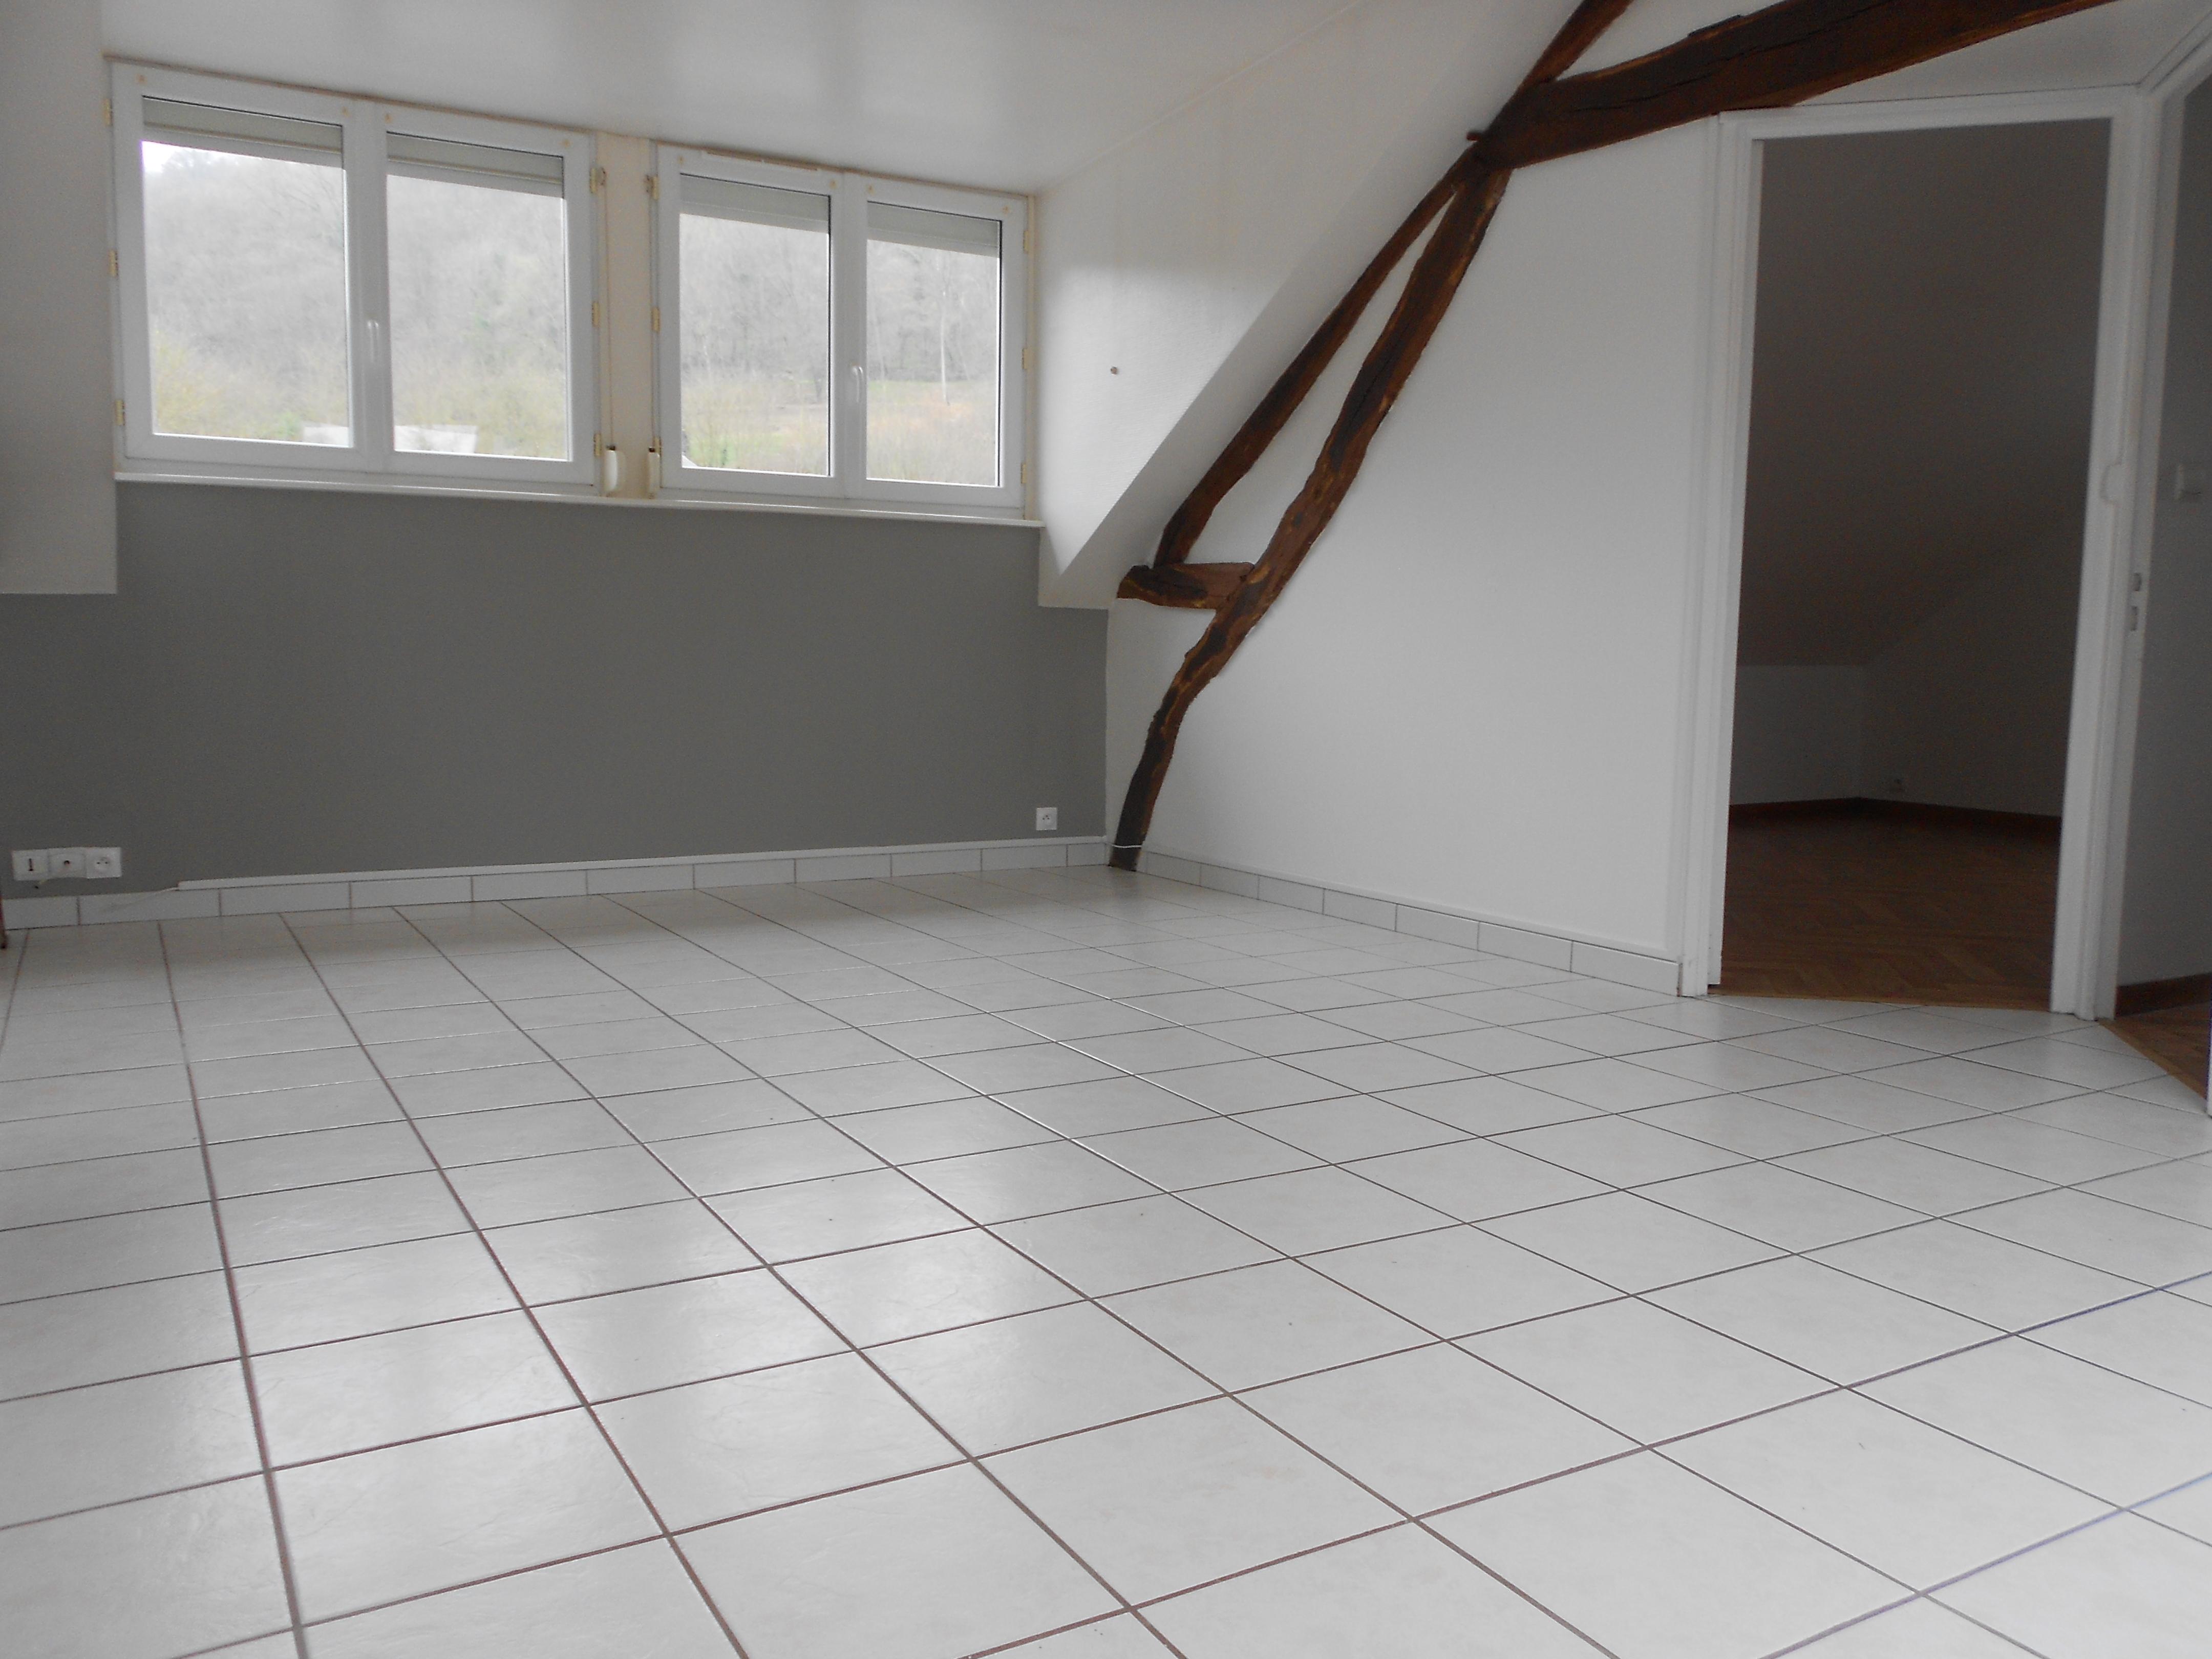 location appartement 3 pièces ST AUBIN EPINAY 76160